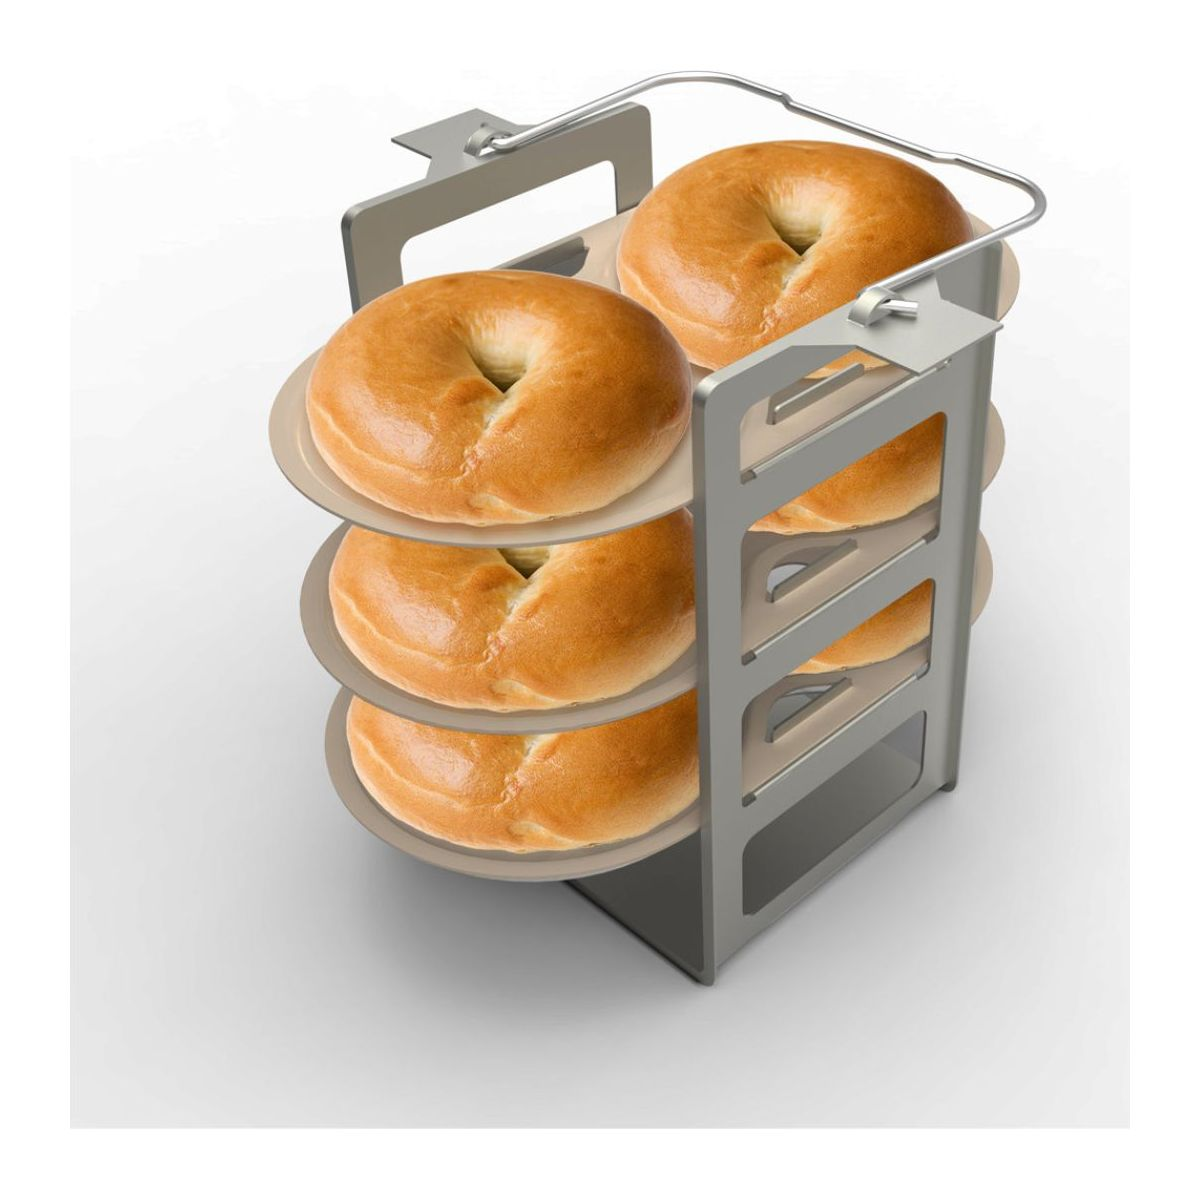 machine a pain bread bagel inox qd 794 a riviera bar. Black Bedroom Furniture Sets. Home Design Ideas